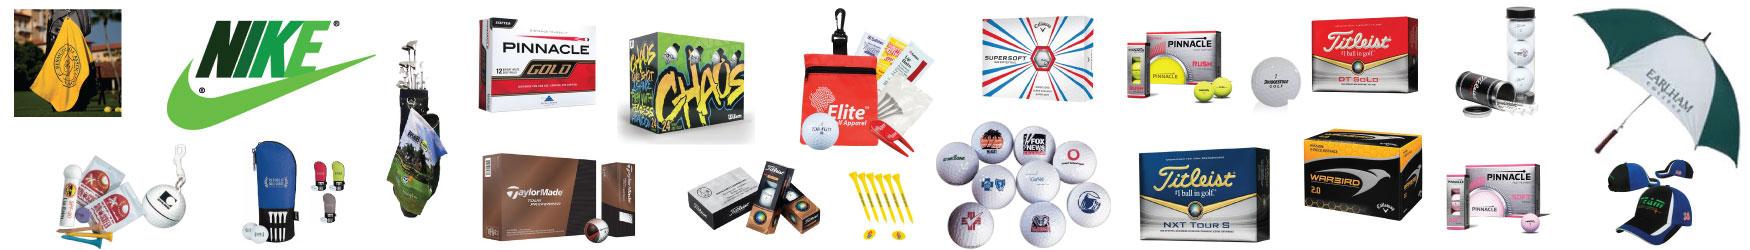 golf balls, golf towels, golf tees, golf tools, golf gear